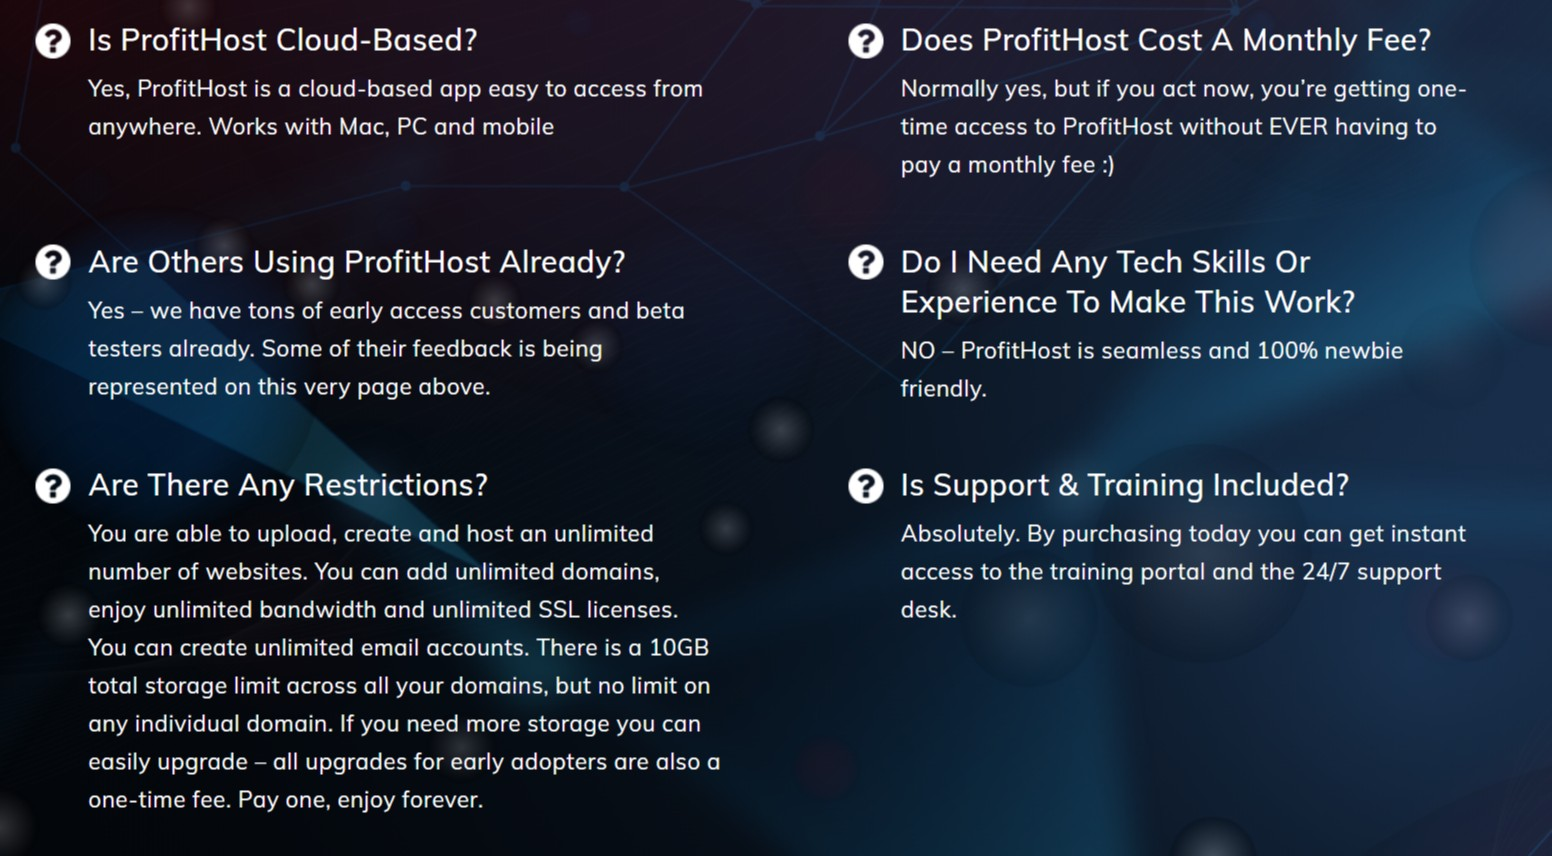 ProfitHost-faq